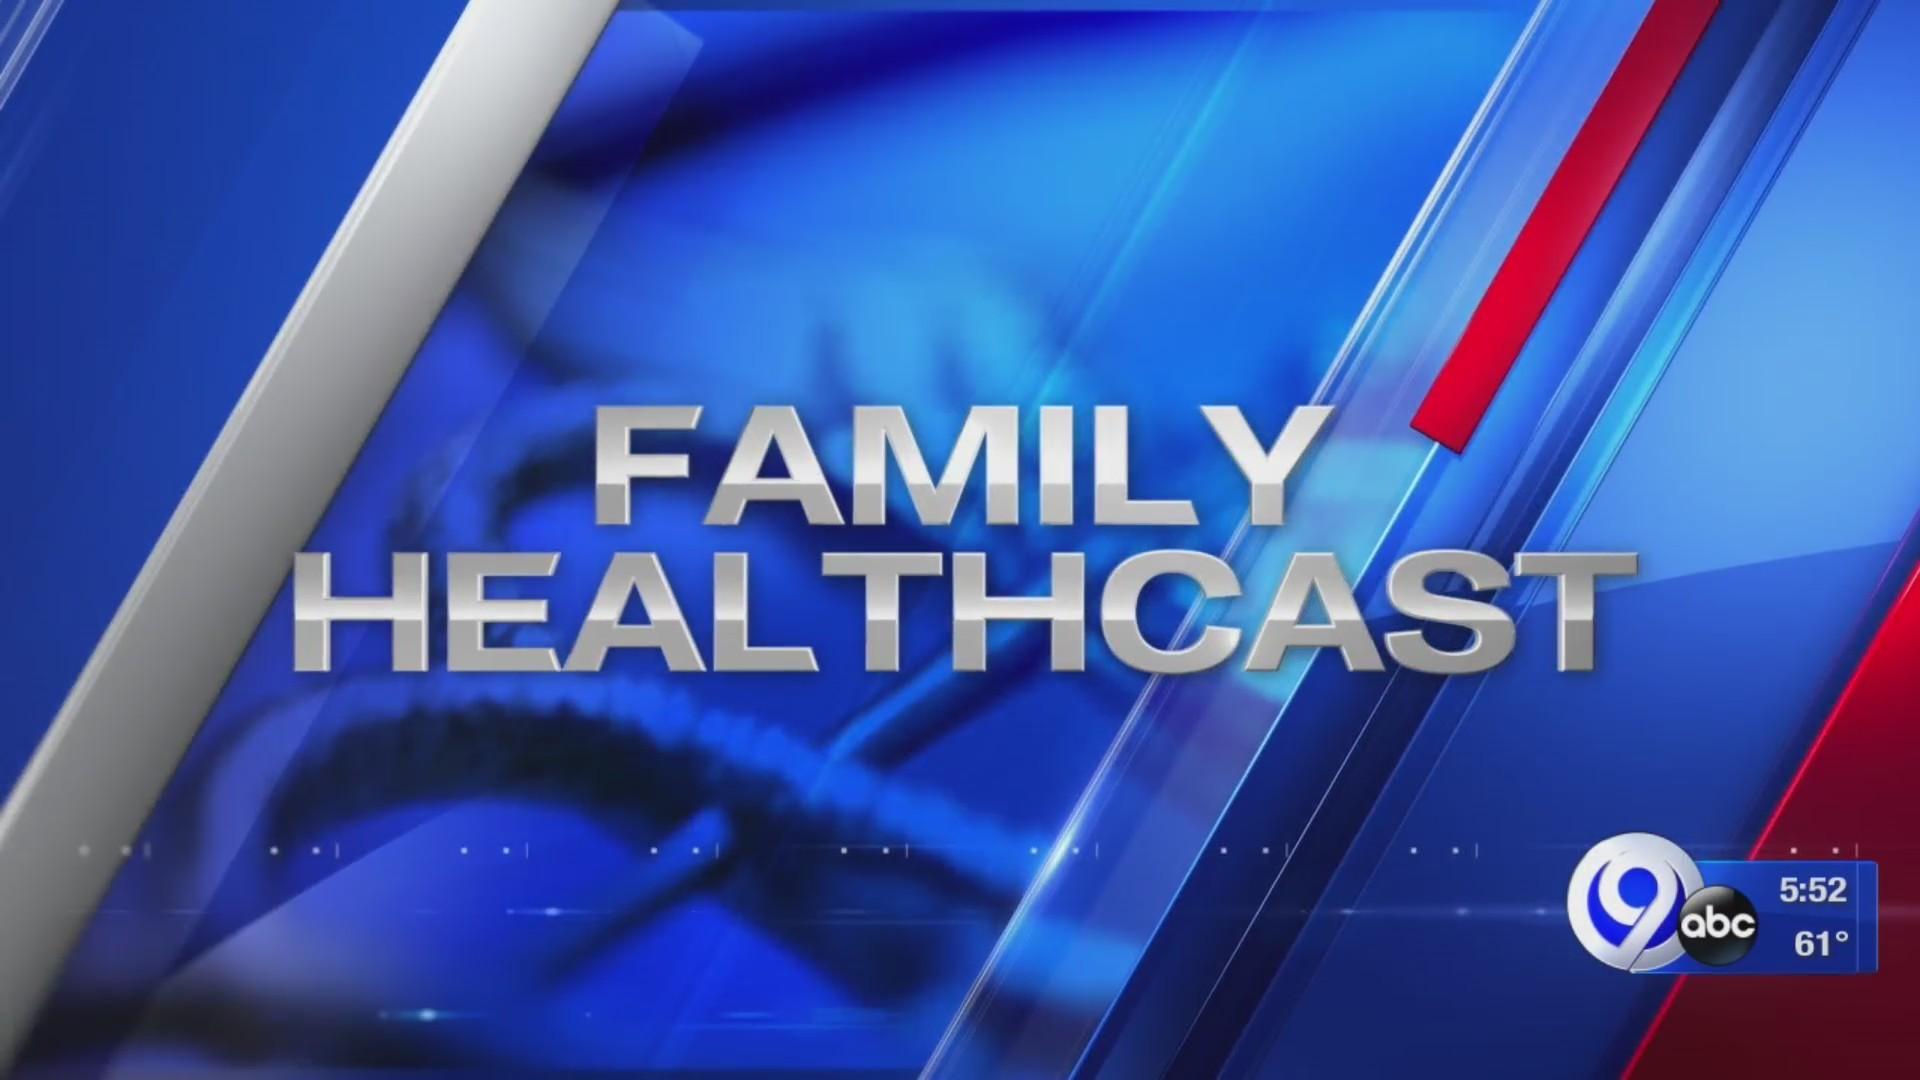 Family_Healthcast__6_10_19_0_20190610220202